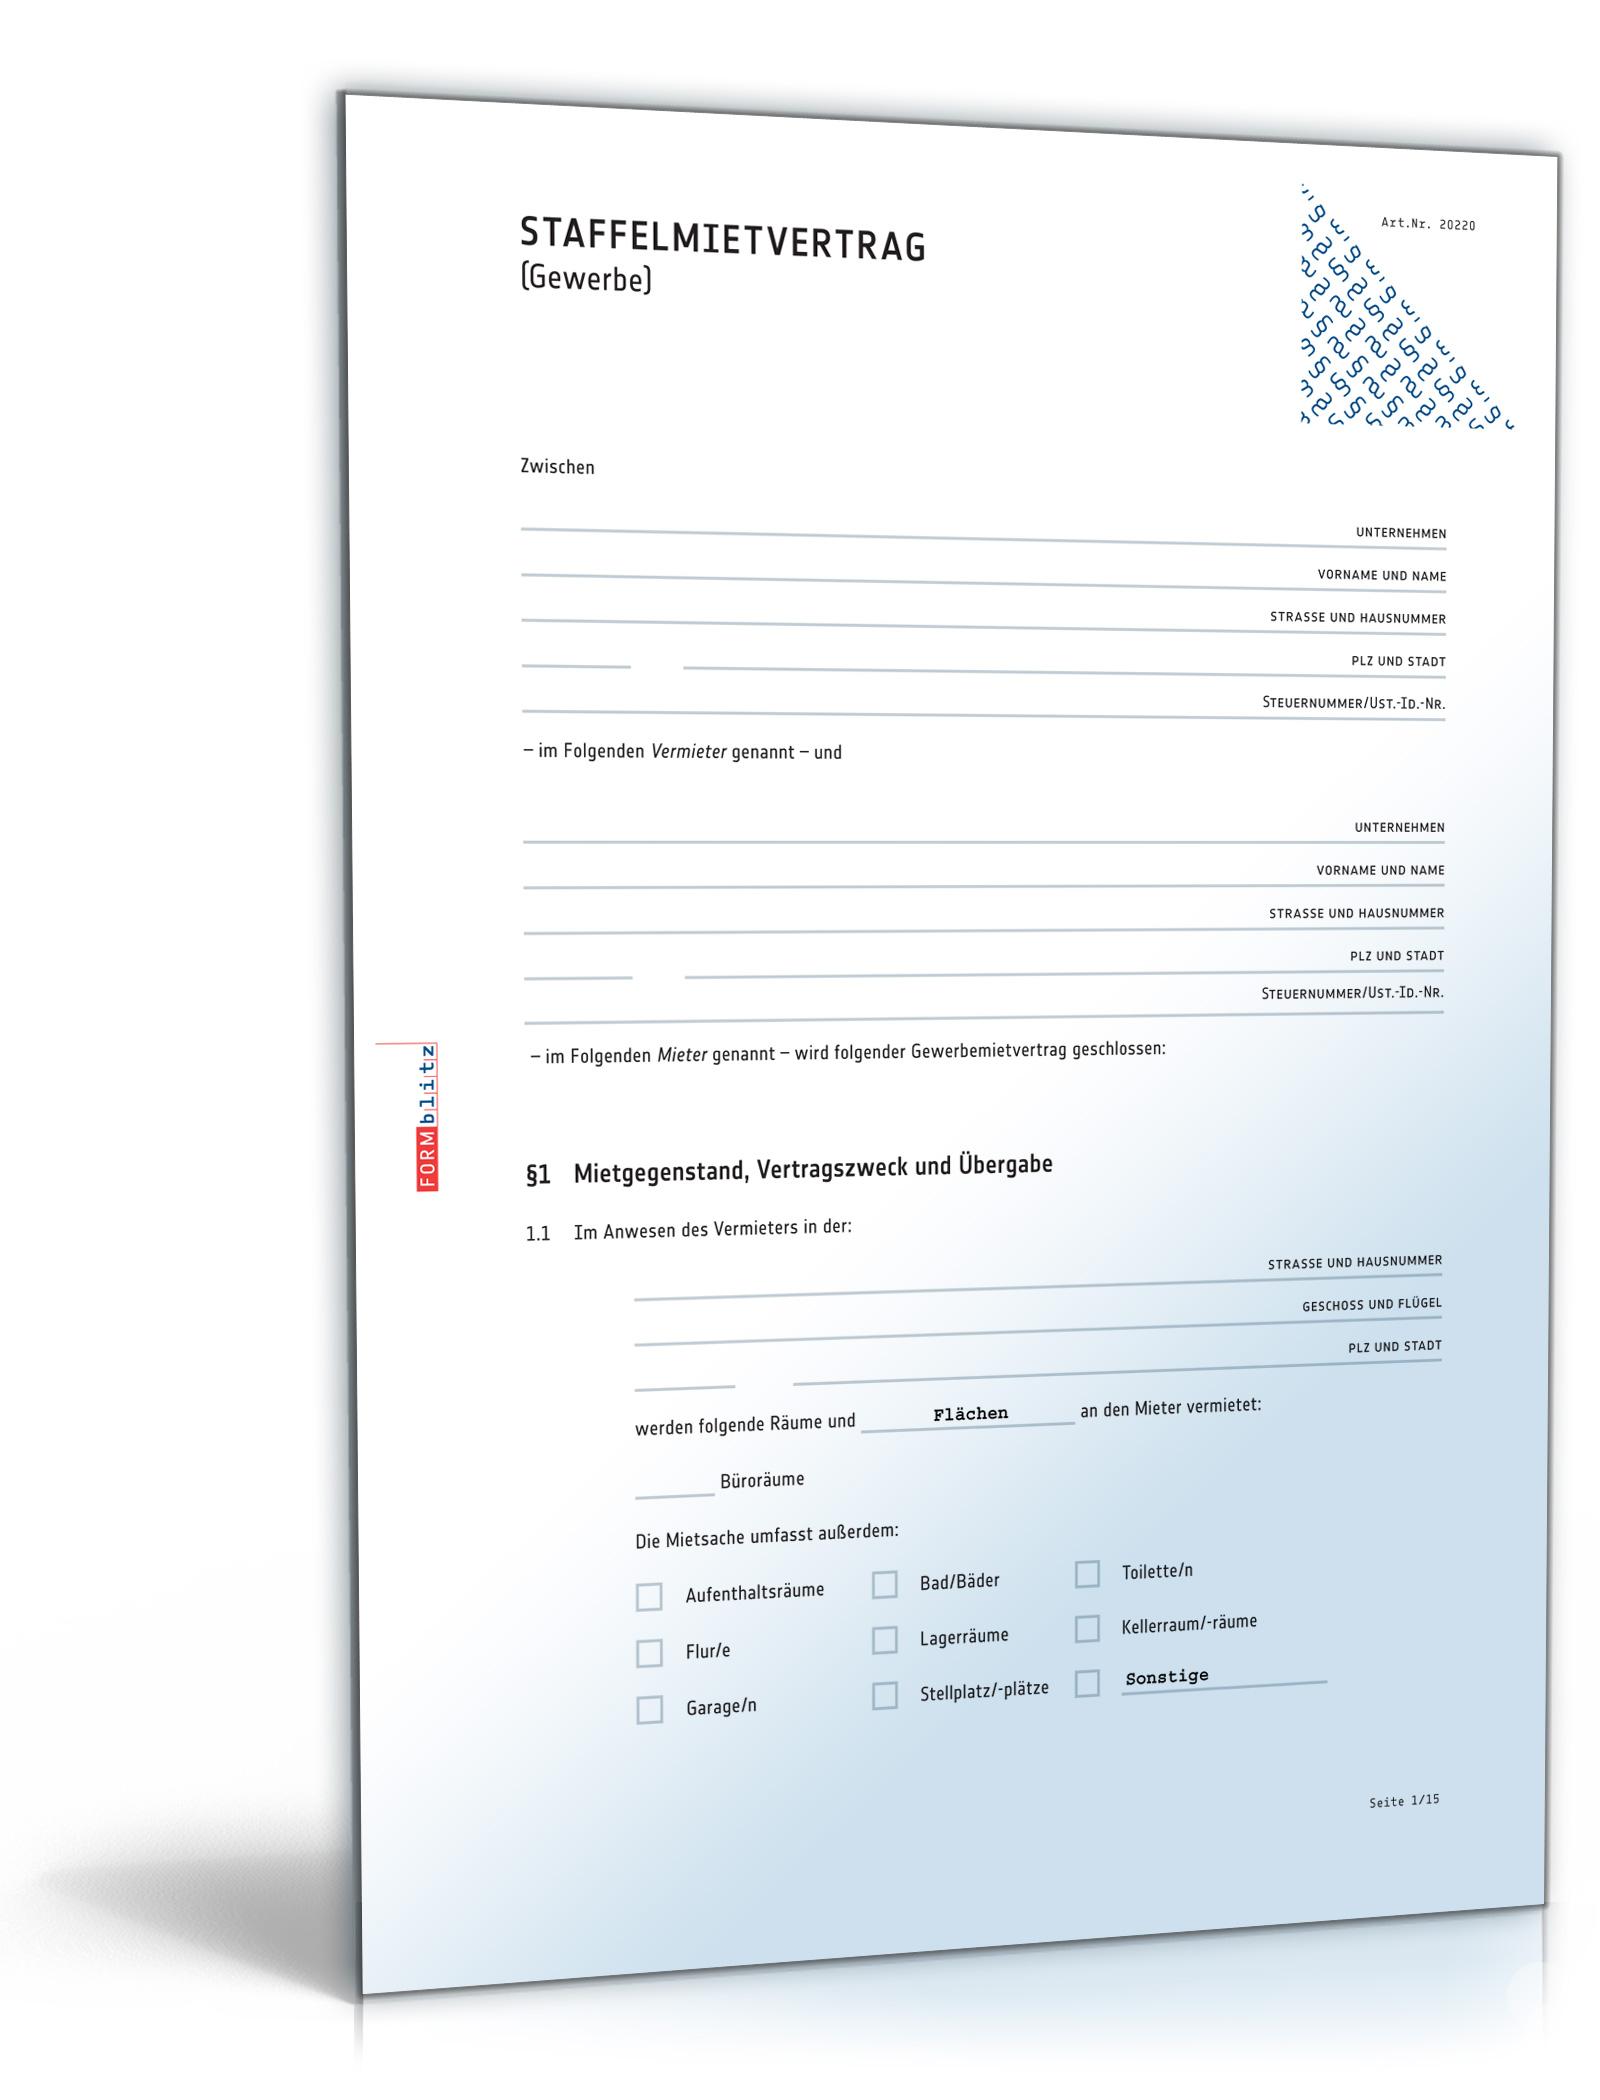 Staffelmietvertrag Gewerbe [PDF Download]